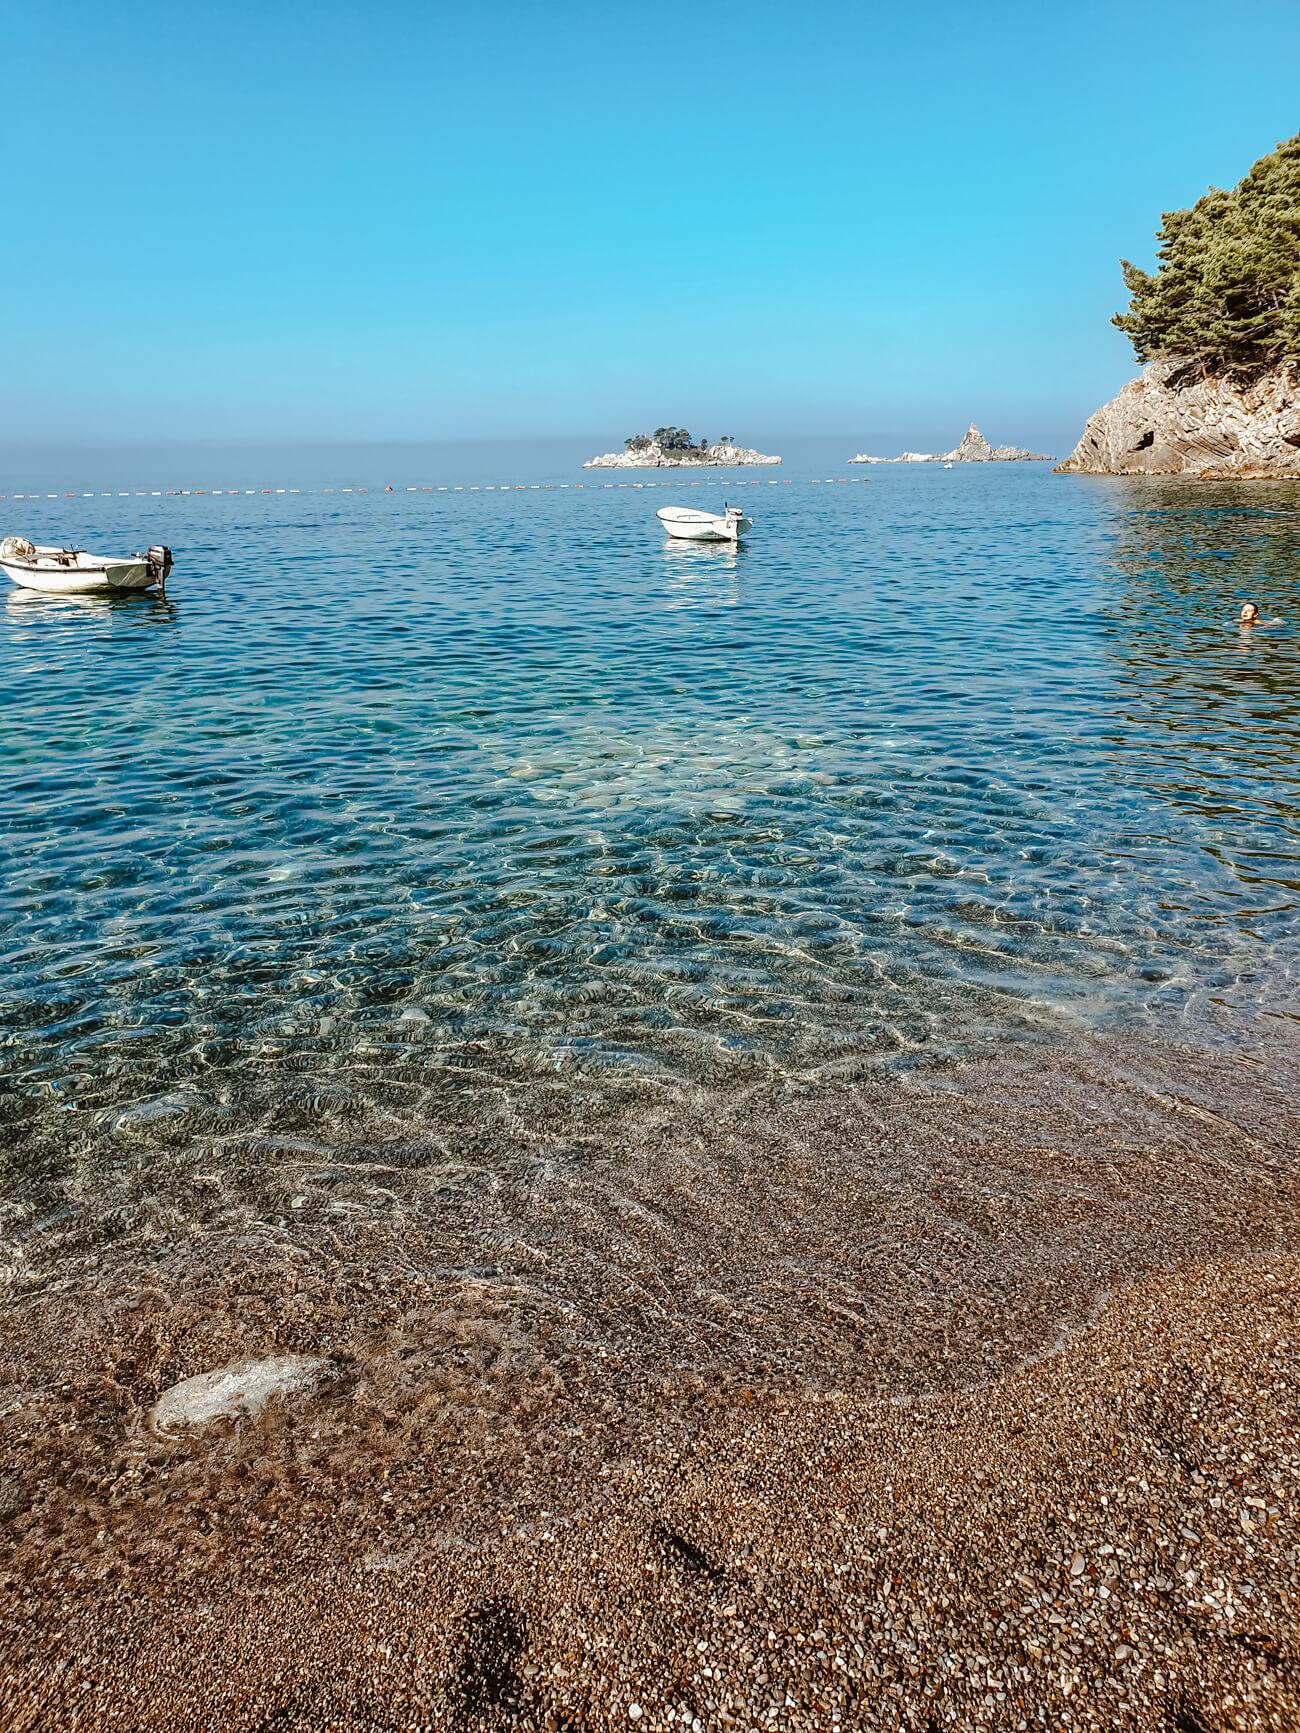 Was ist in Montenegro sehenswert?